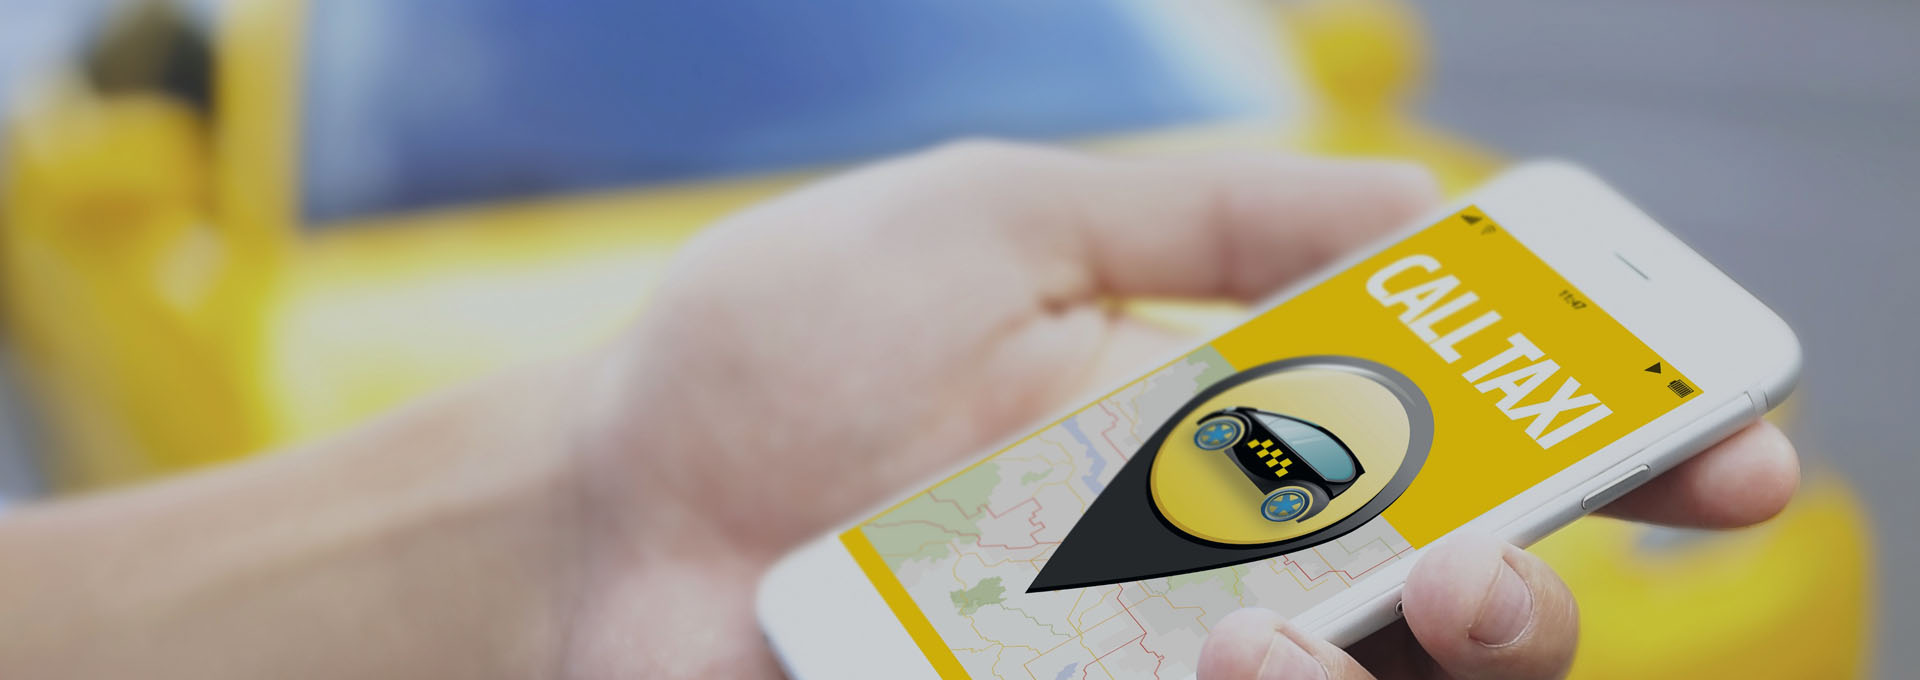 Taxi Booking Software Development-banner-2